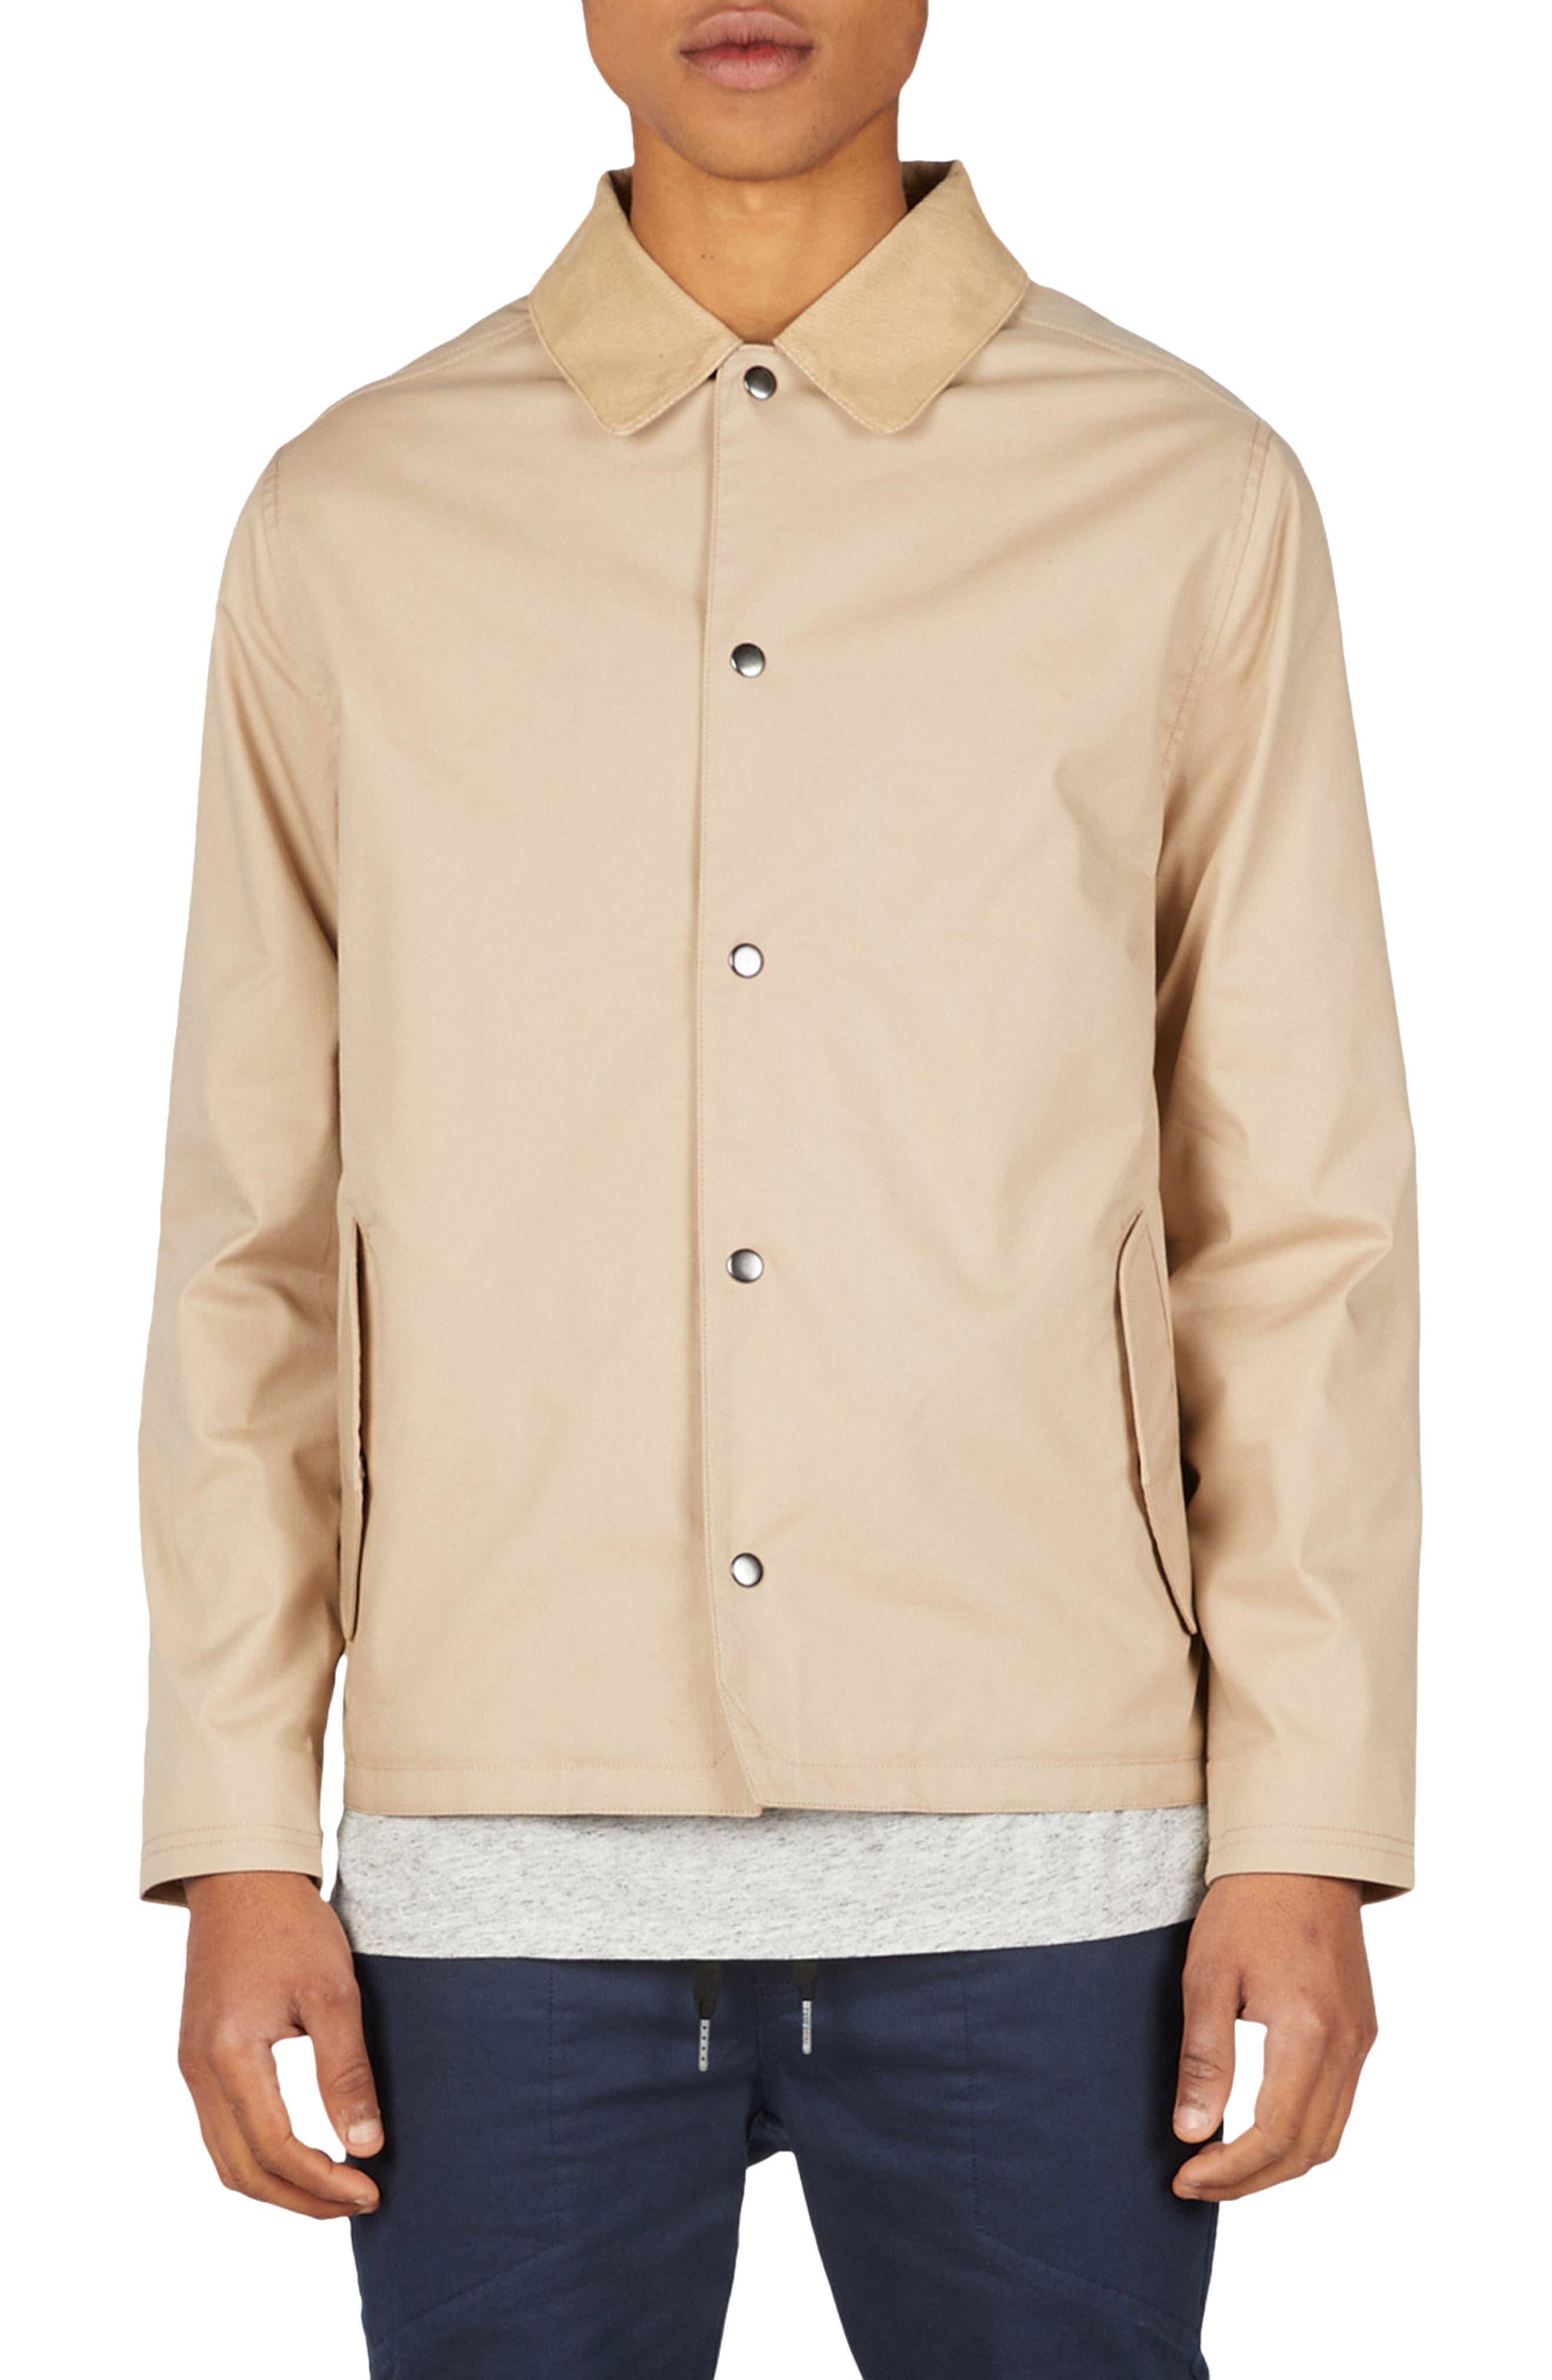 Coach's Jacket,                         Main,                         color, Natural/ Black